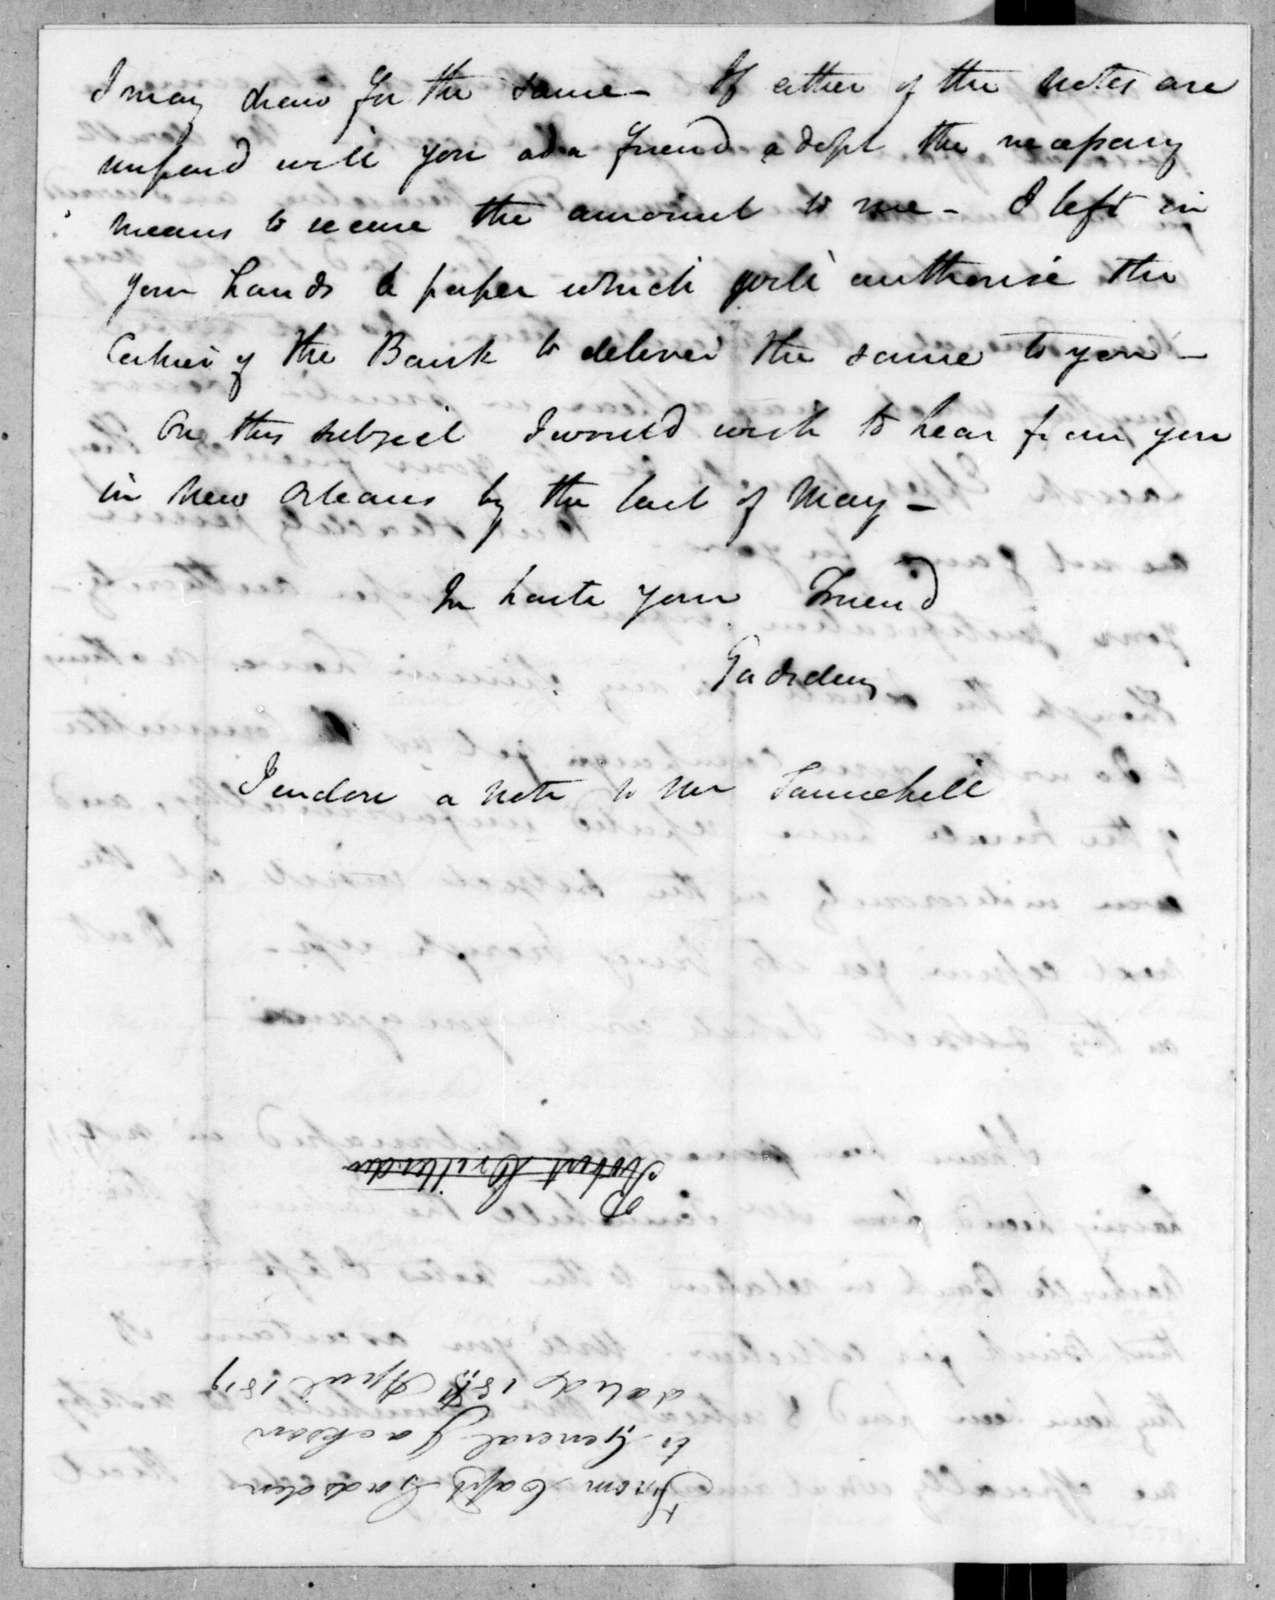 James Gadsden to Andrew Jackson, April 18, 1819